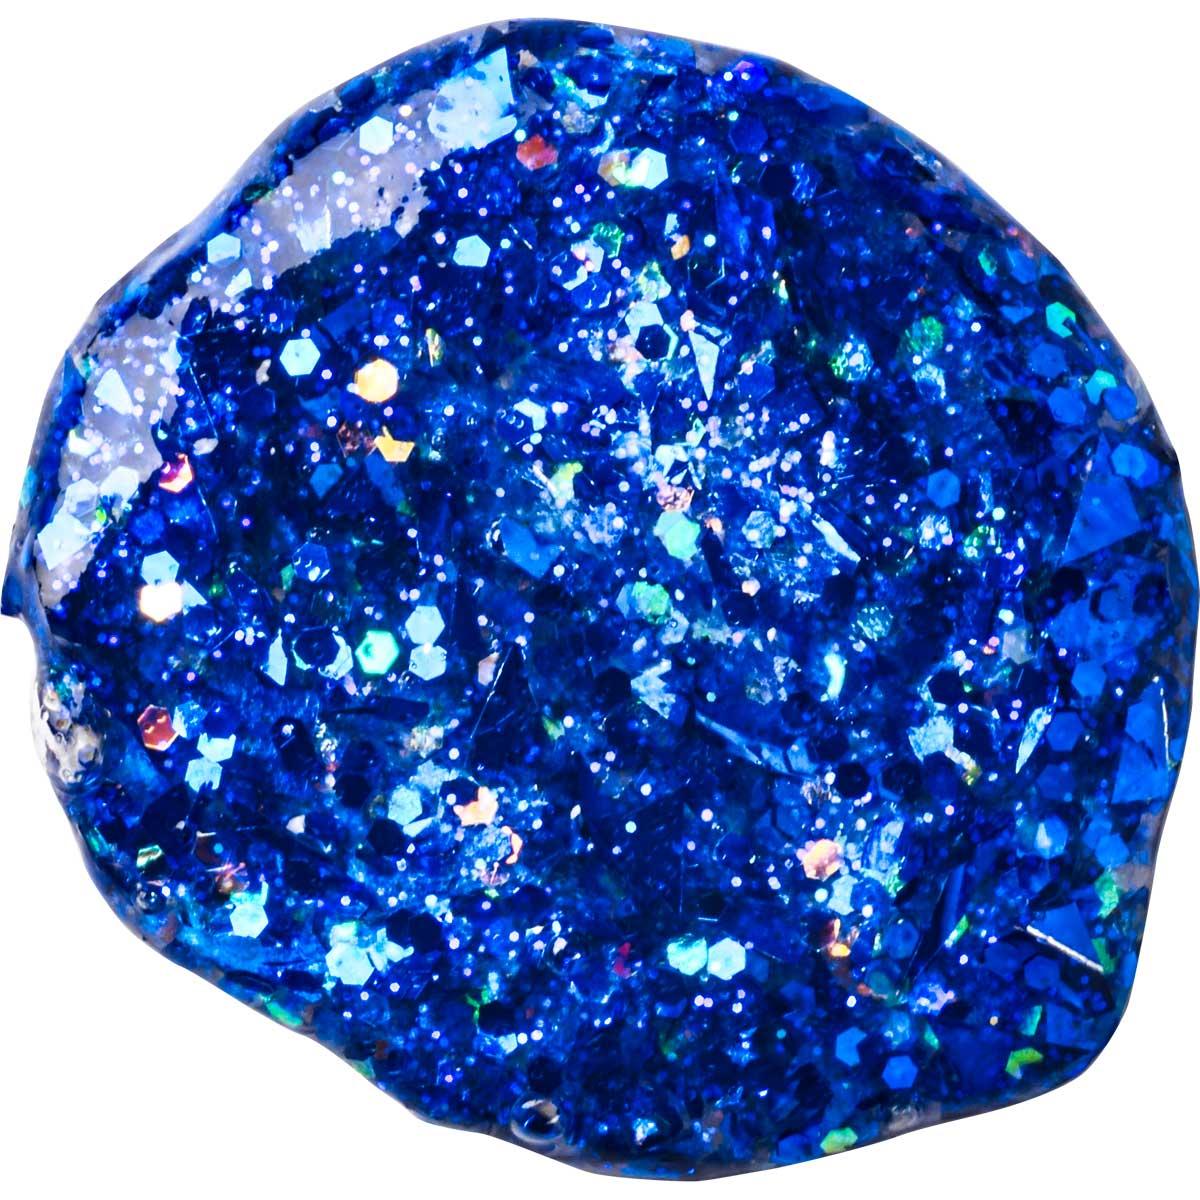 FolkArt ® Glitterific™ Acrylic Paint - Dark Blue, 2 oz.